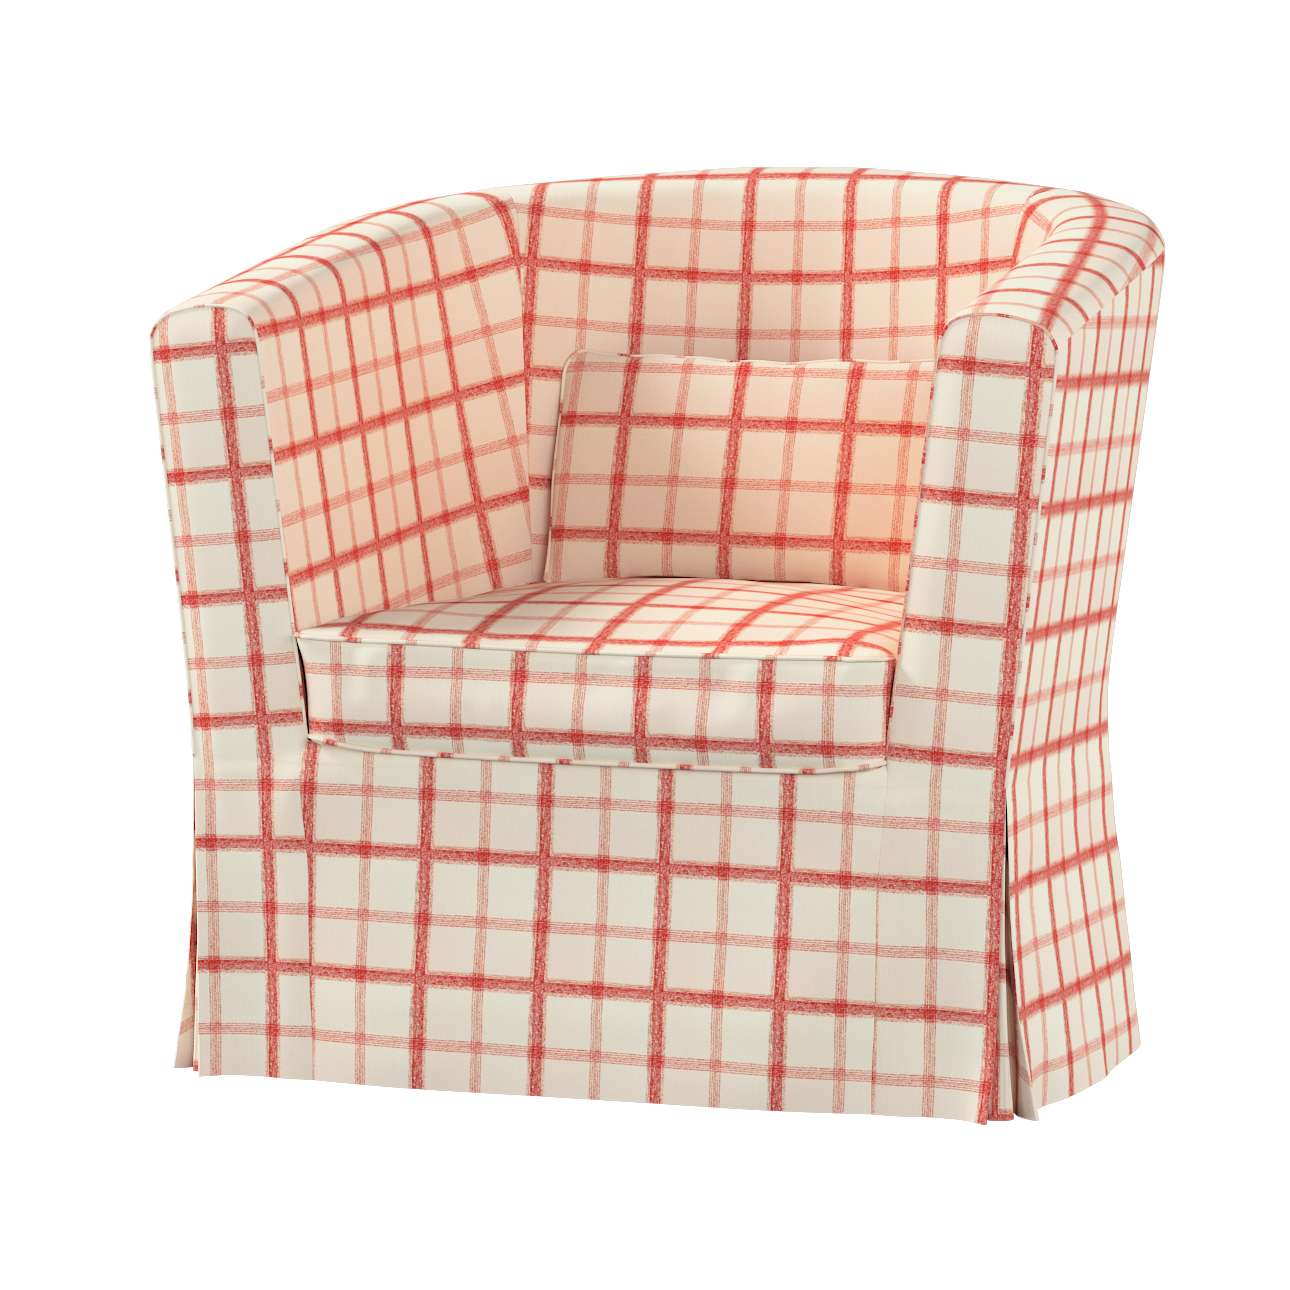 Ektorp Tullsta Sesselbezug Sesselhusse, Ektorp Tullsta von der Kollektion Avinon, Stoff: 131-15